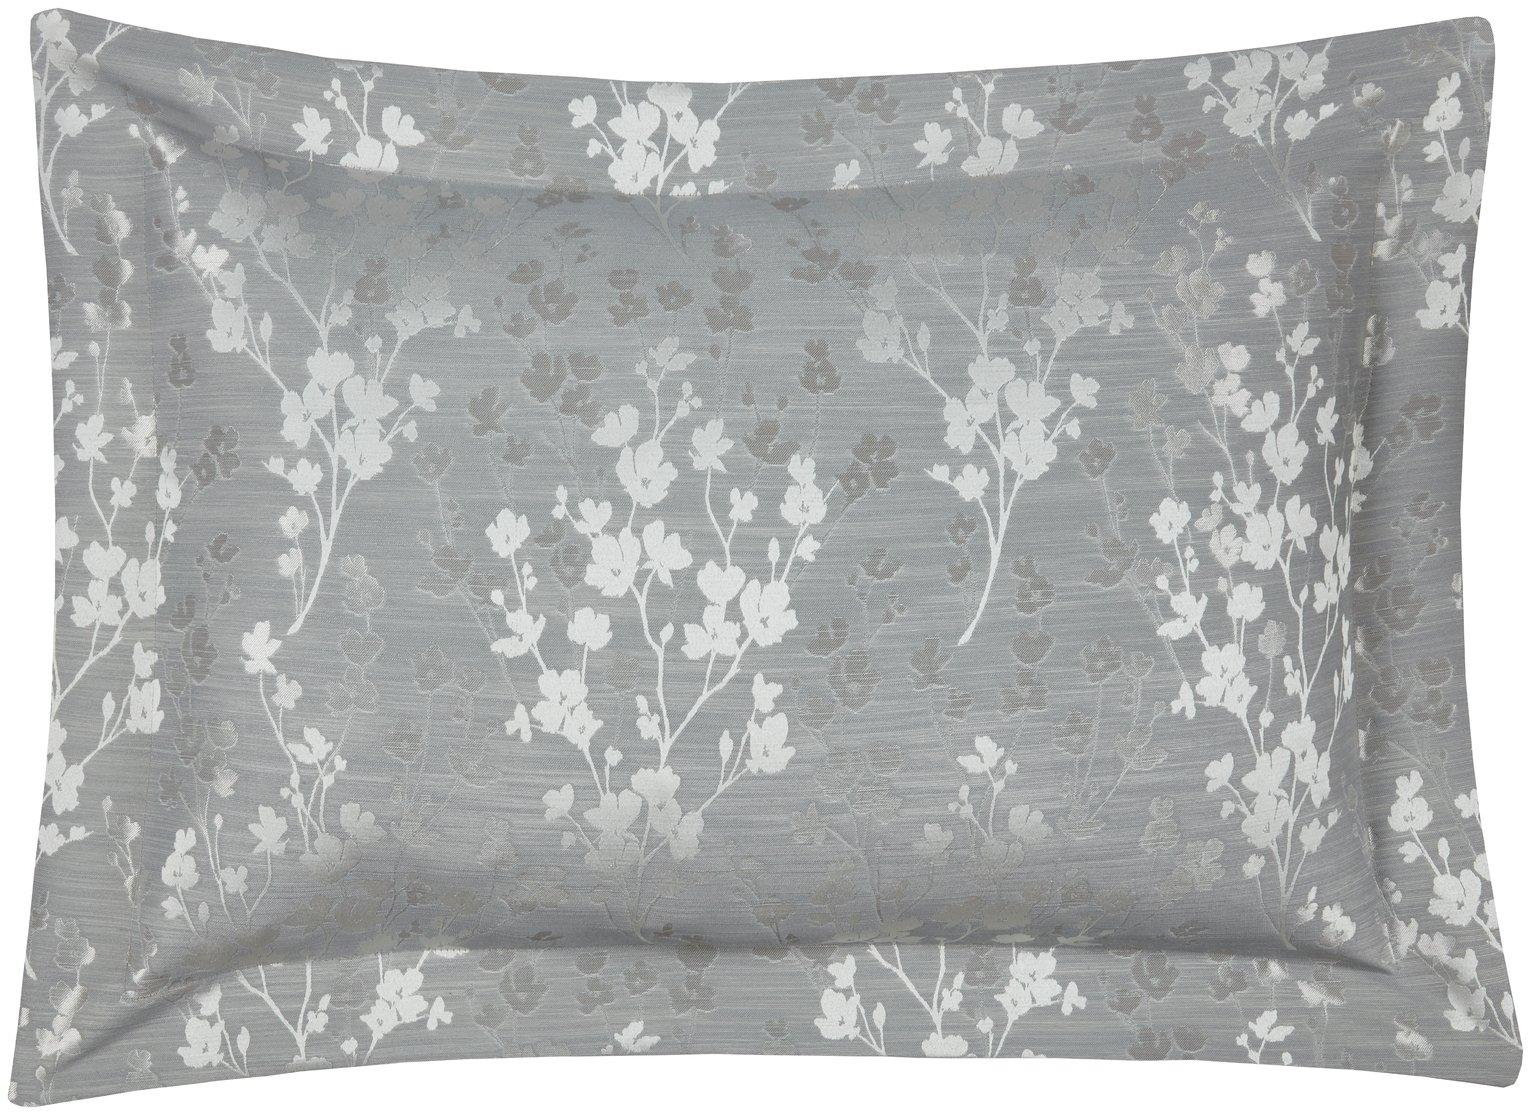 Julian Charles Blossom Pair of Oxford Pillowcases.